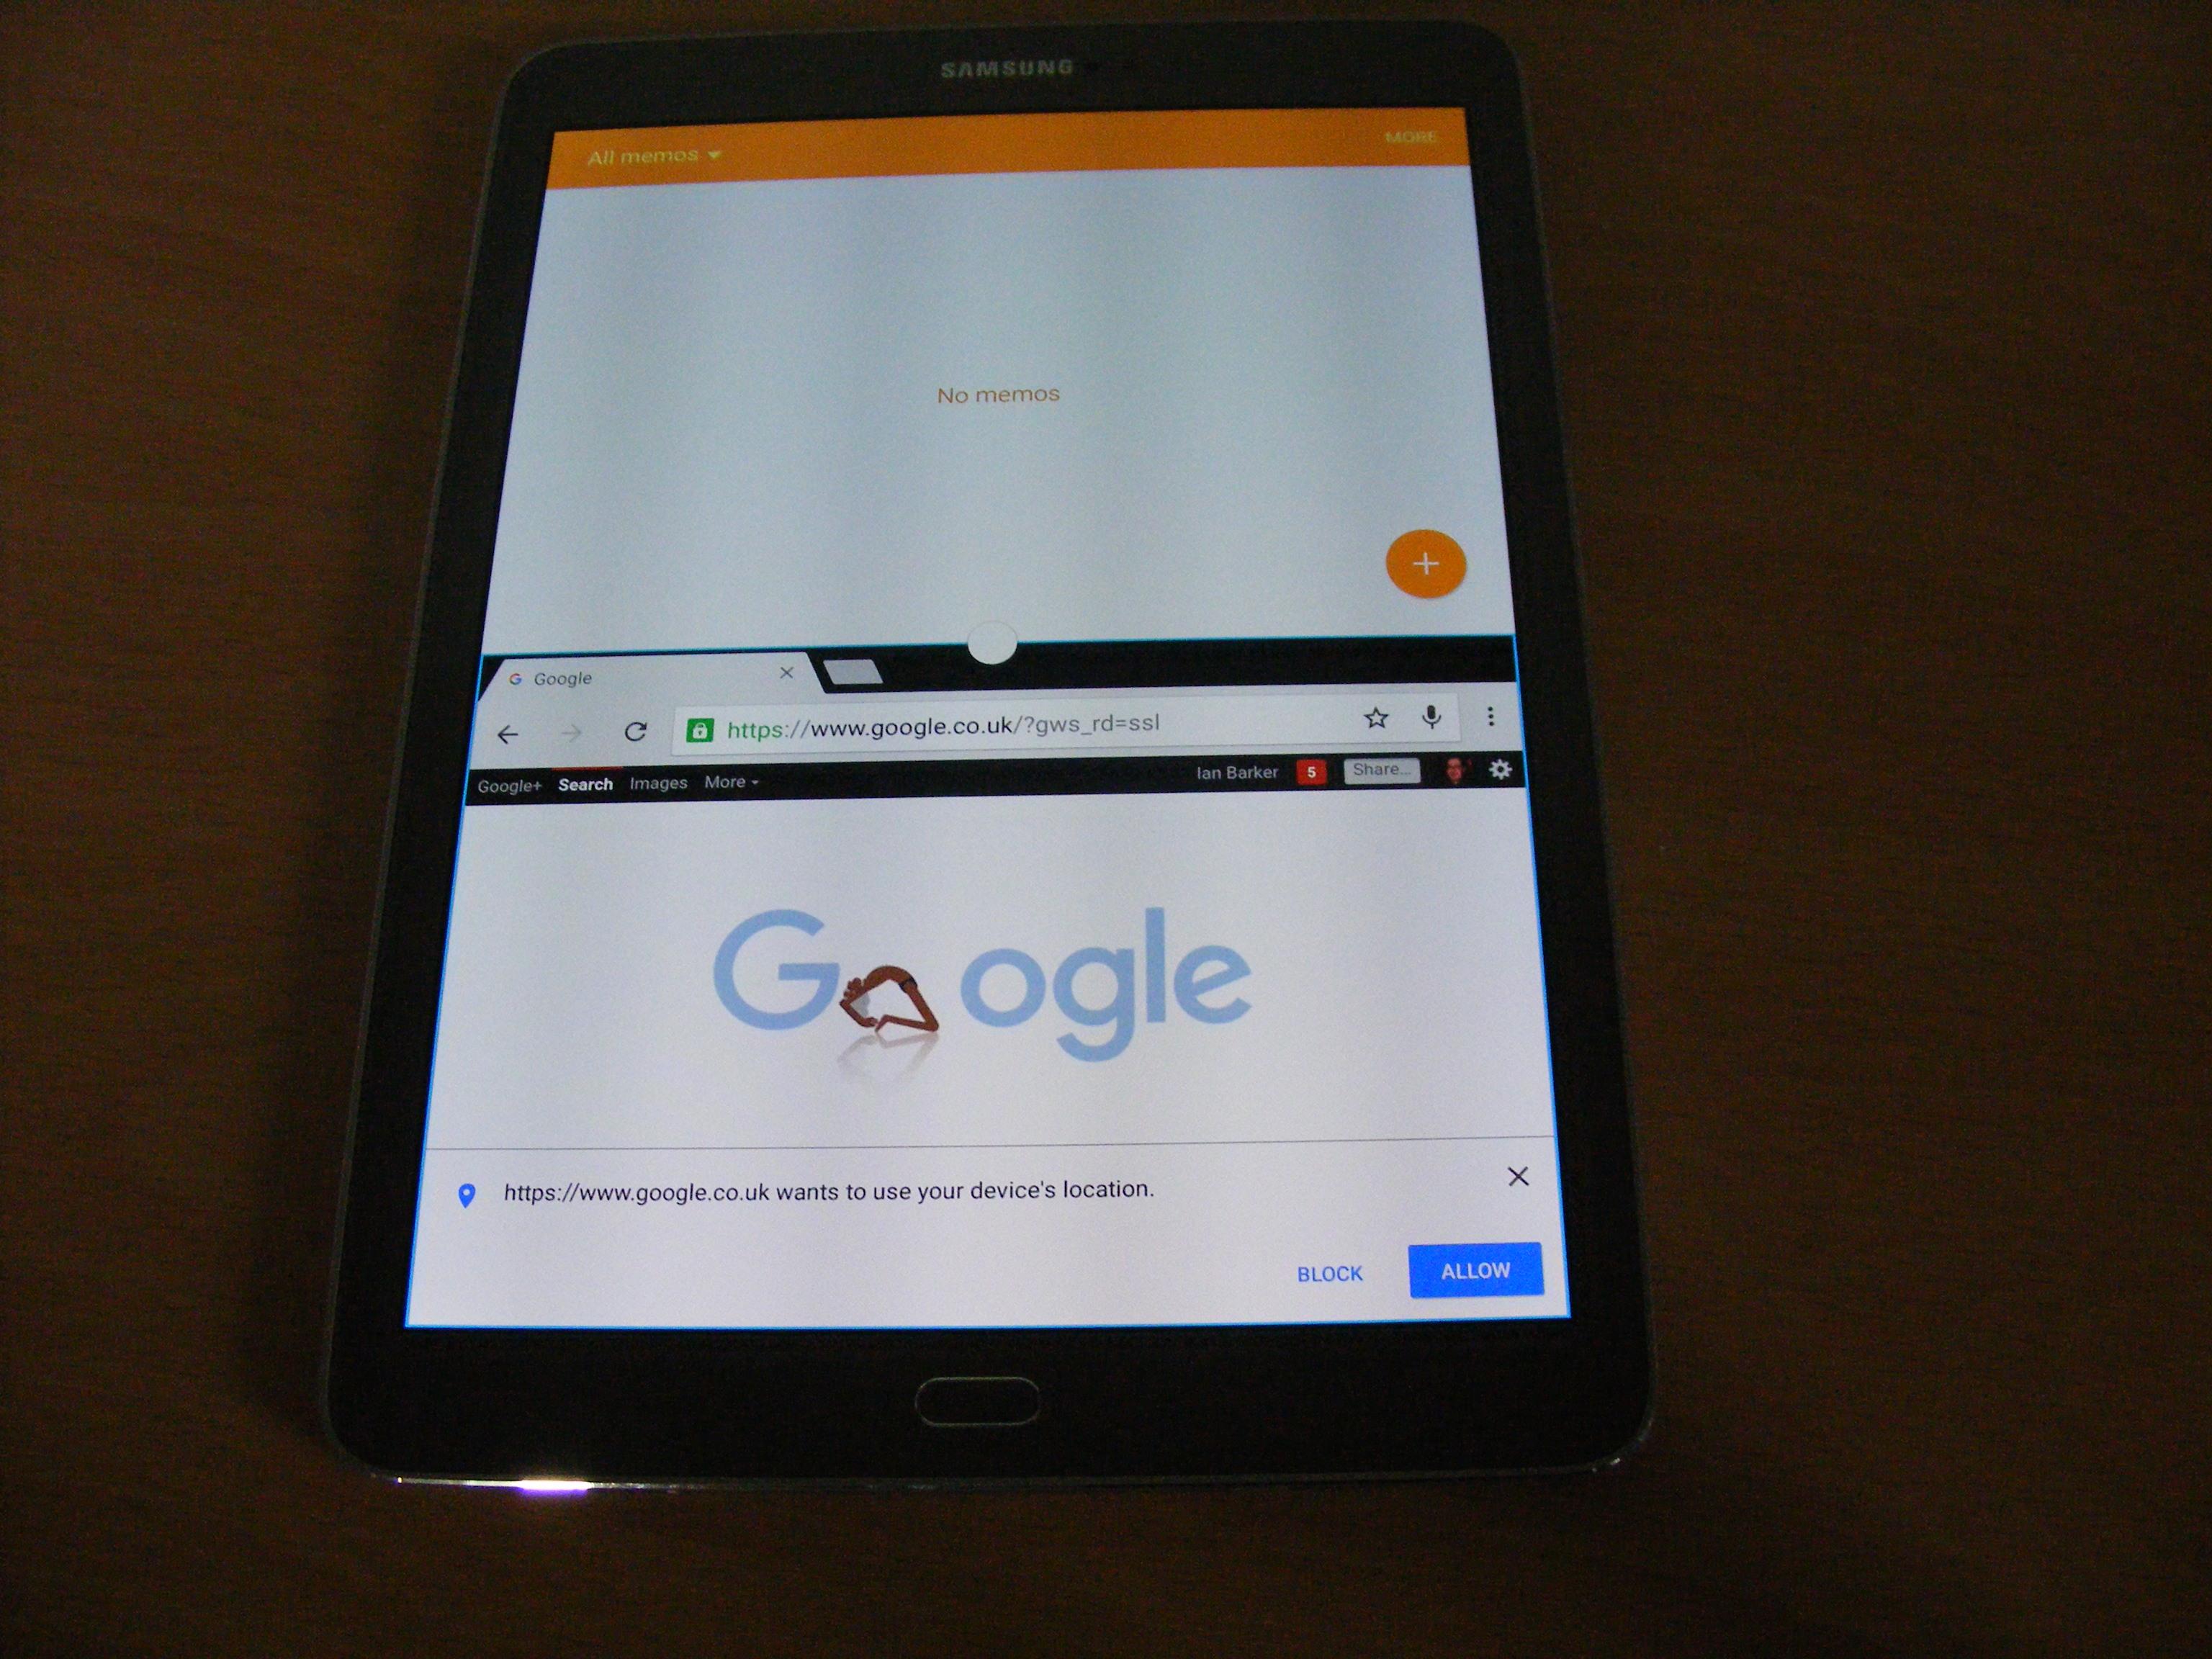 Galaxy Tab multi window